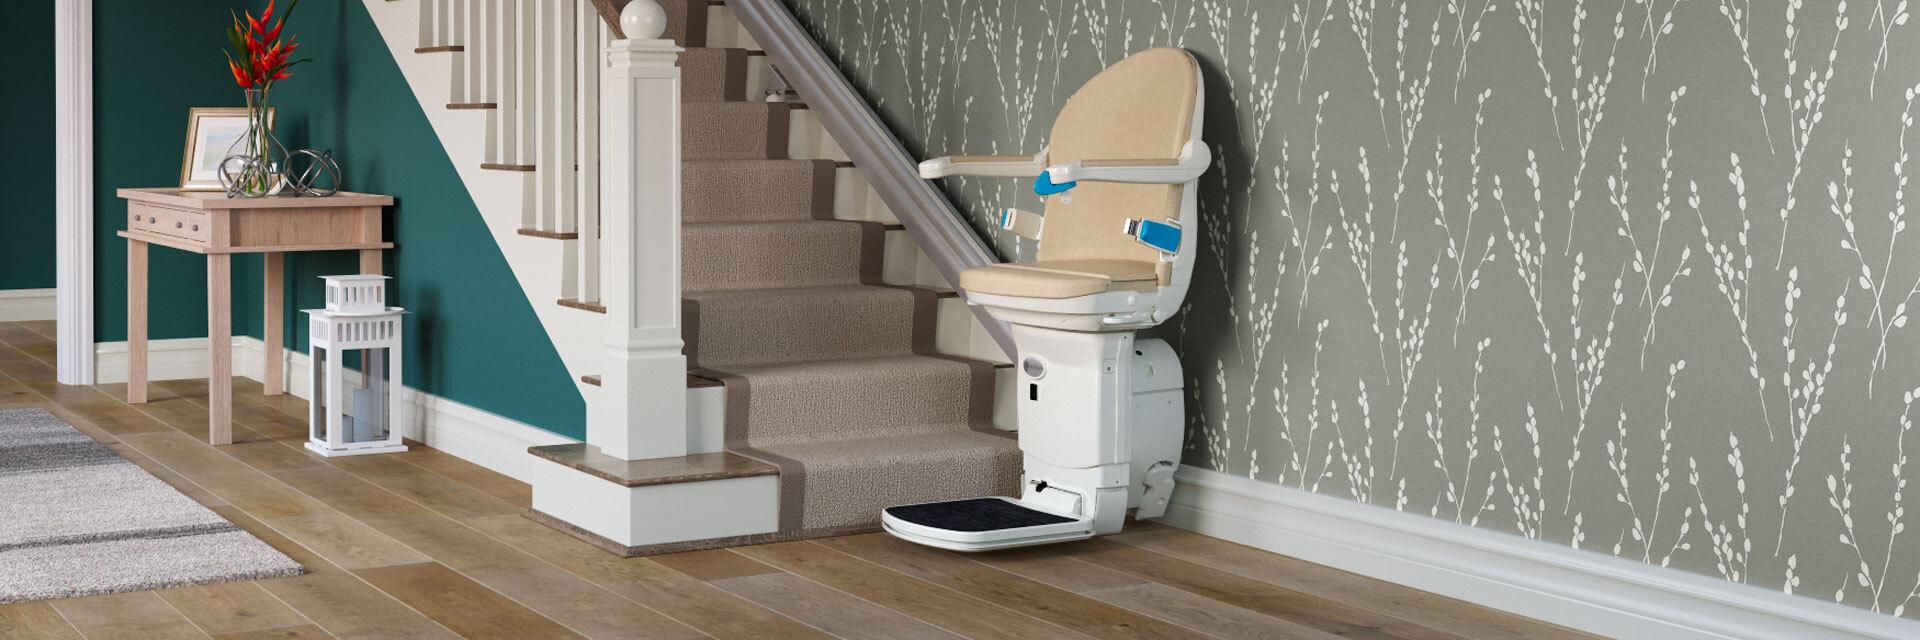 Straight Stairlift | Handicare 1000 on